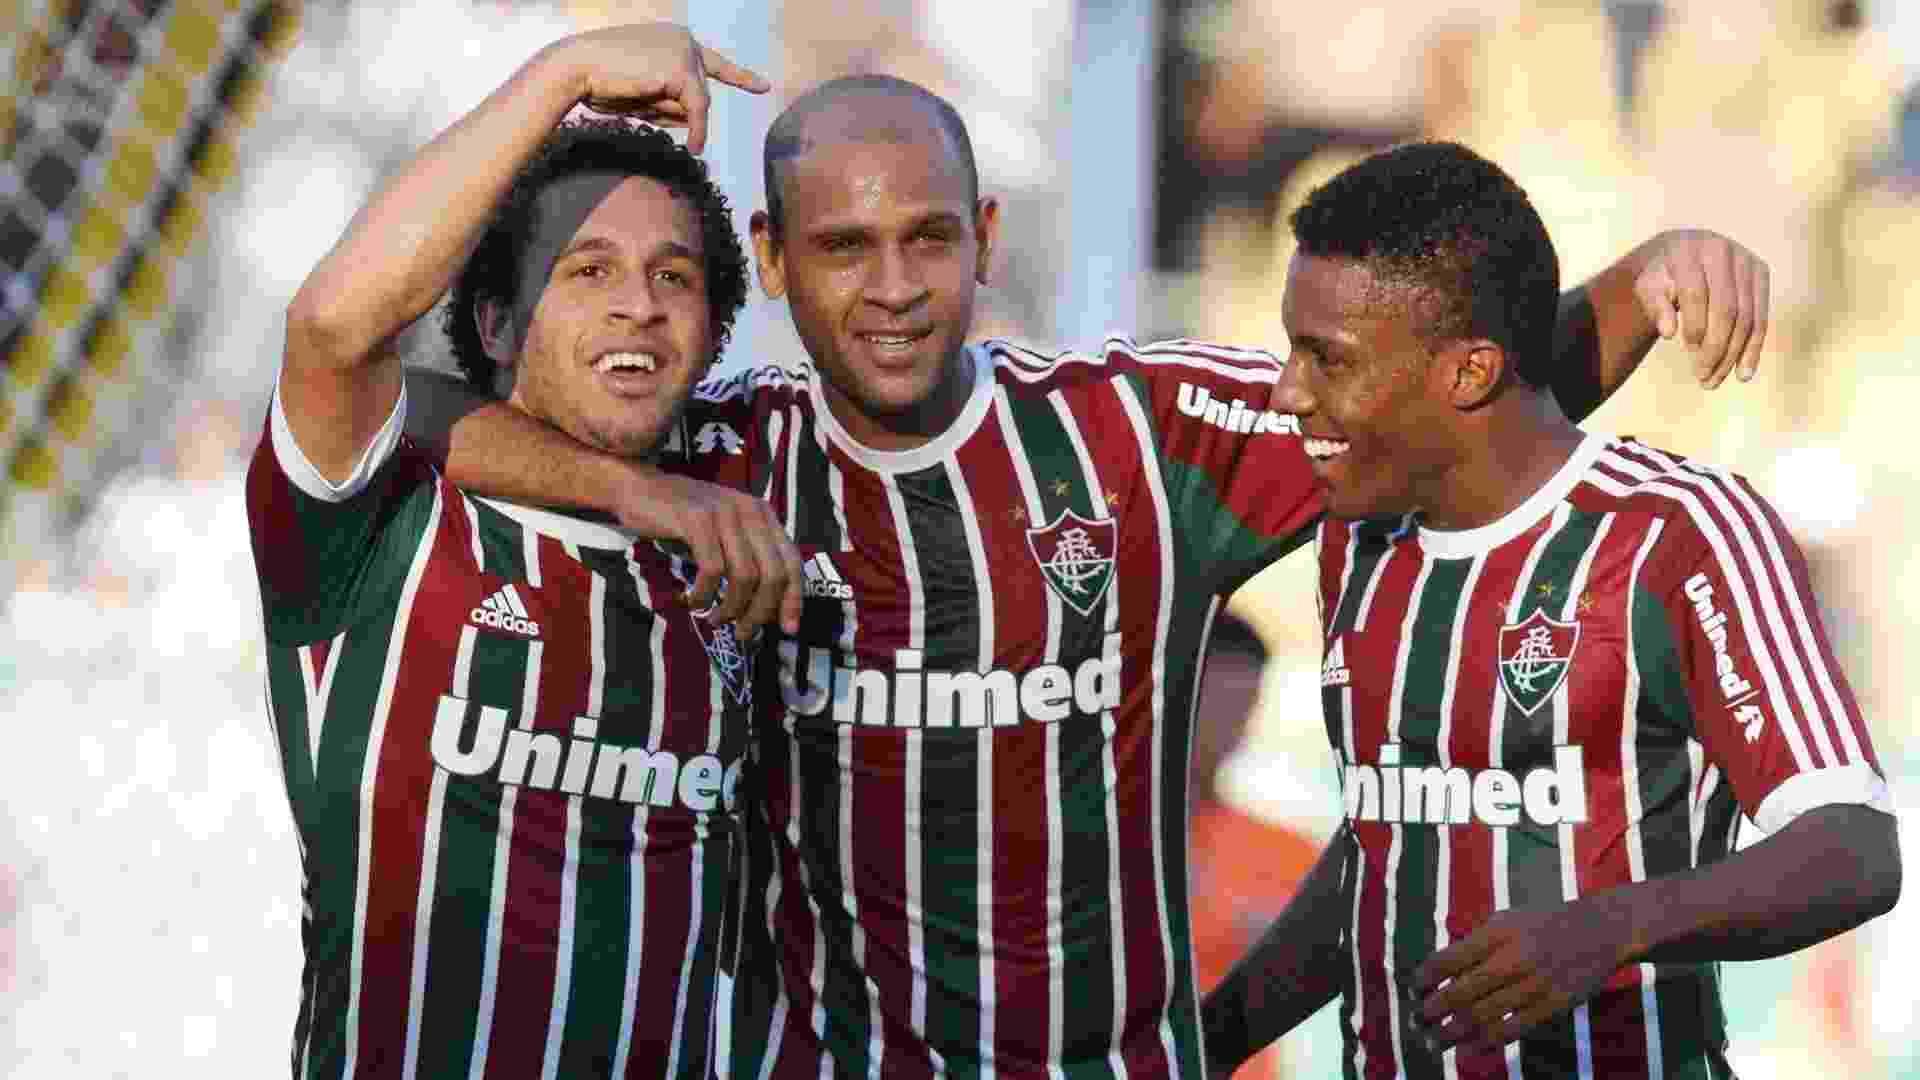 28.abr.2013 - Jogadores do Fluminense comemoram após Wellington Nem (esq) marcar o segundo do Fluminense contra o Volta Redonda, pela semifinal do Campeonato Carioca - Rossana Fraga/Photocamera